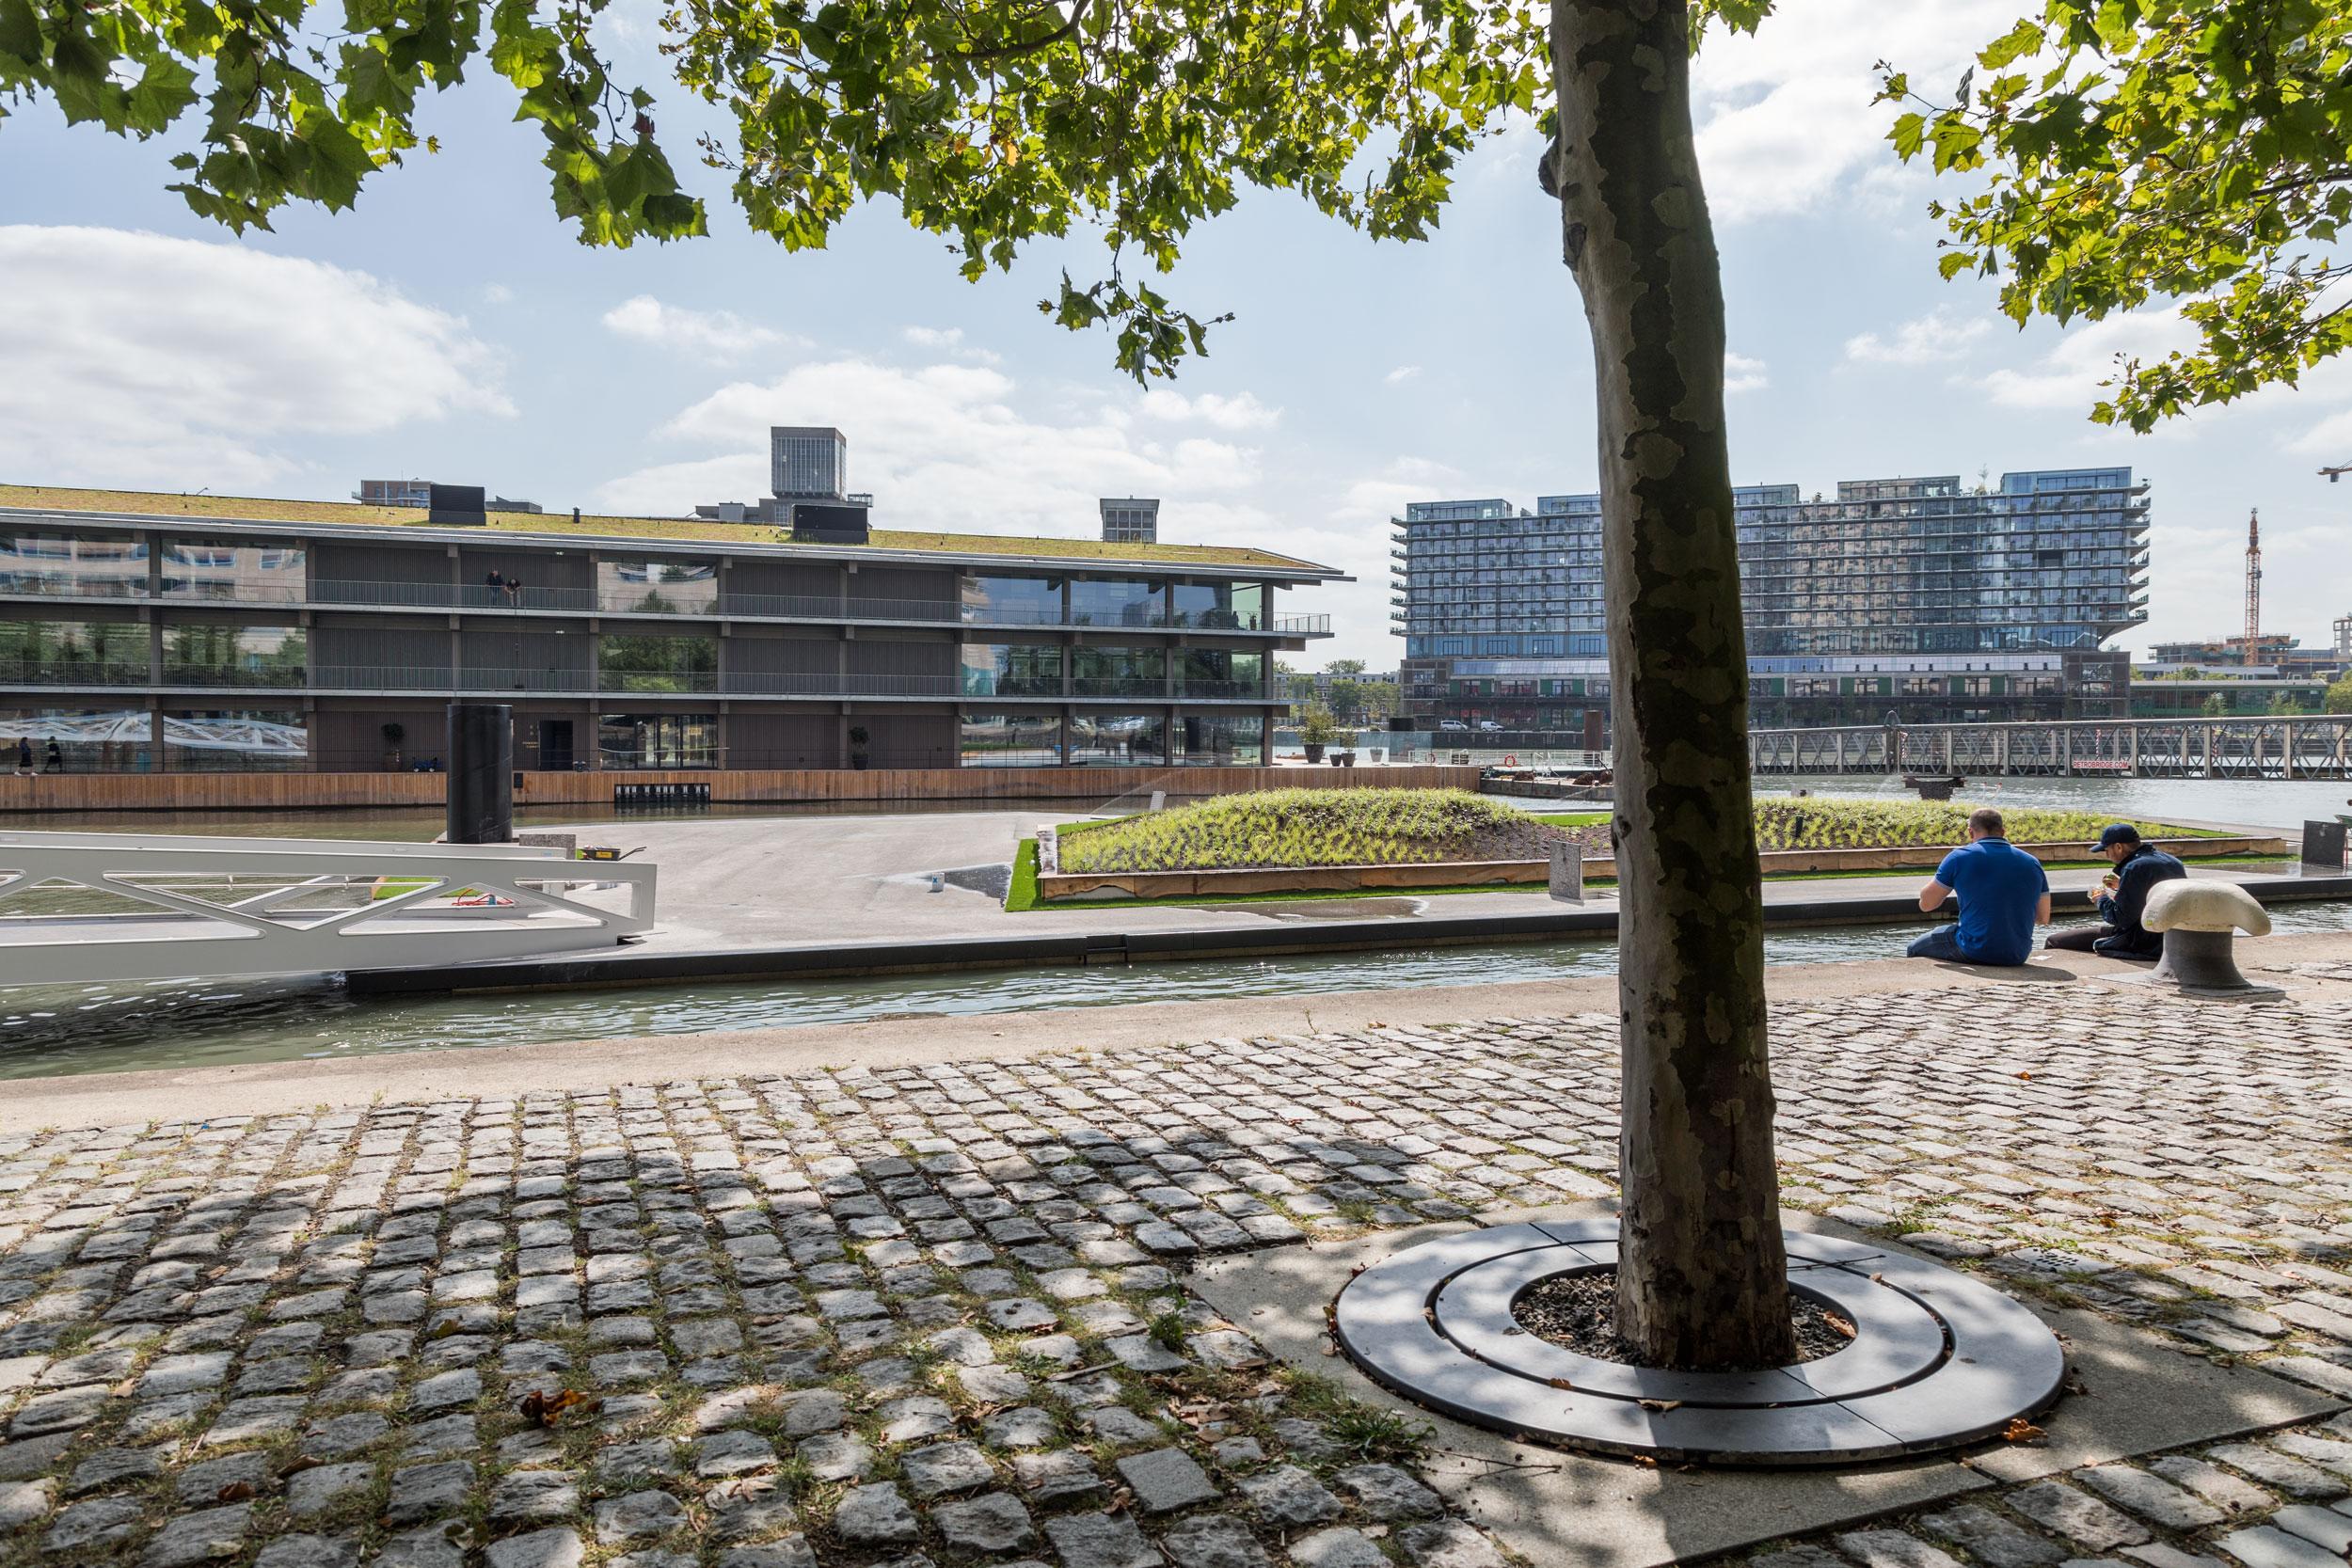 Rijnhaven_Vers Beton_Sylvana Lansu (1)